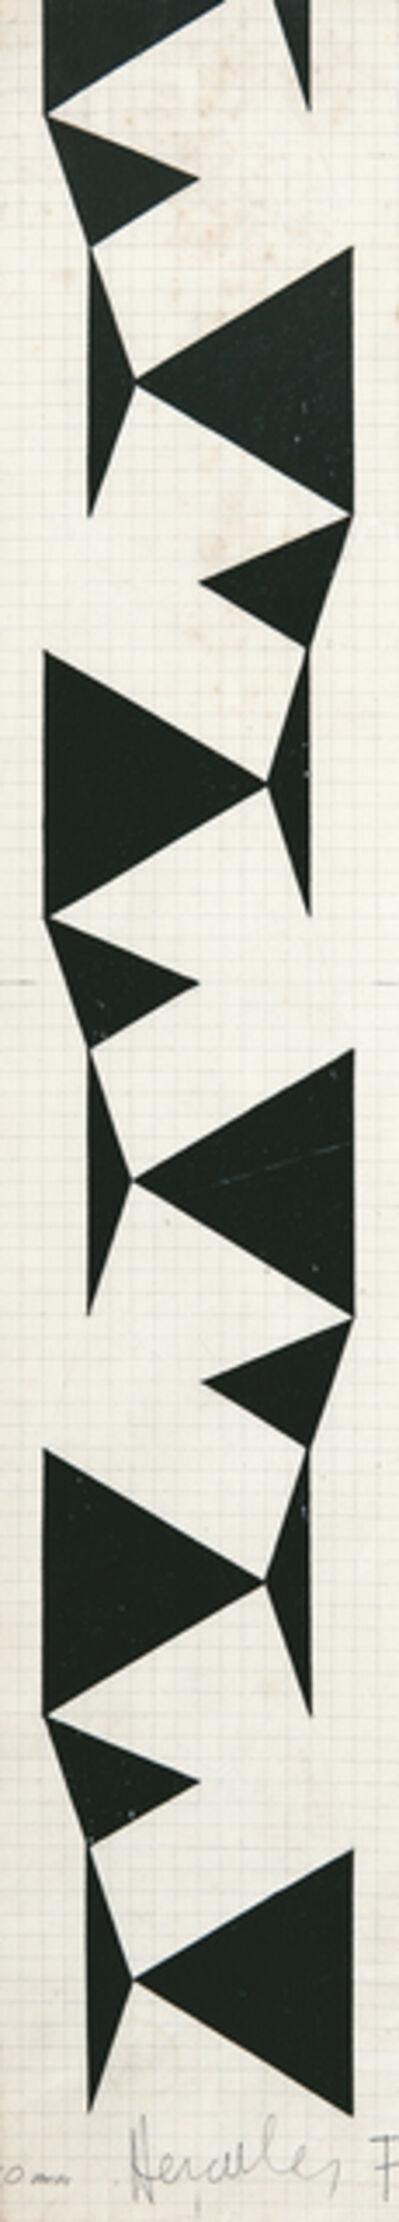 Hercules Barsotti, 'Untitled', ca. 1950